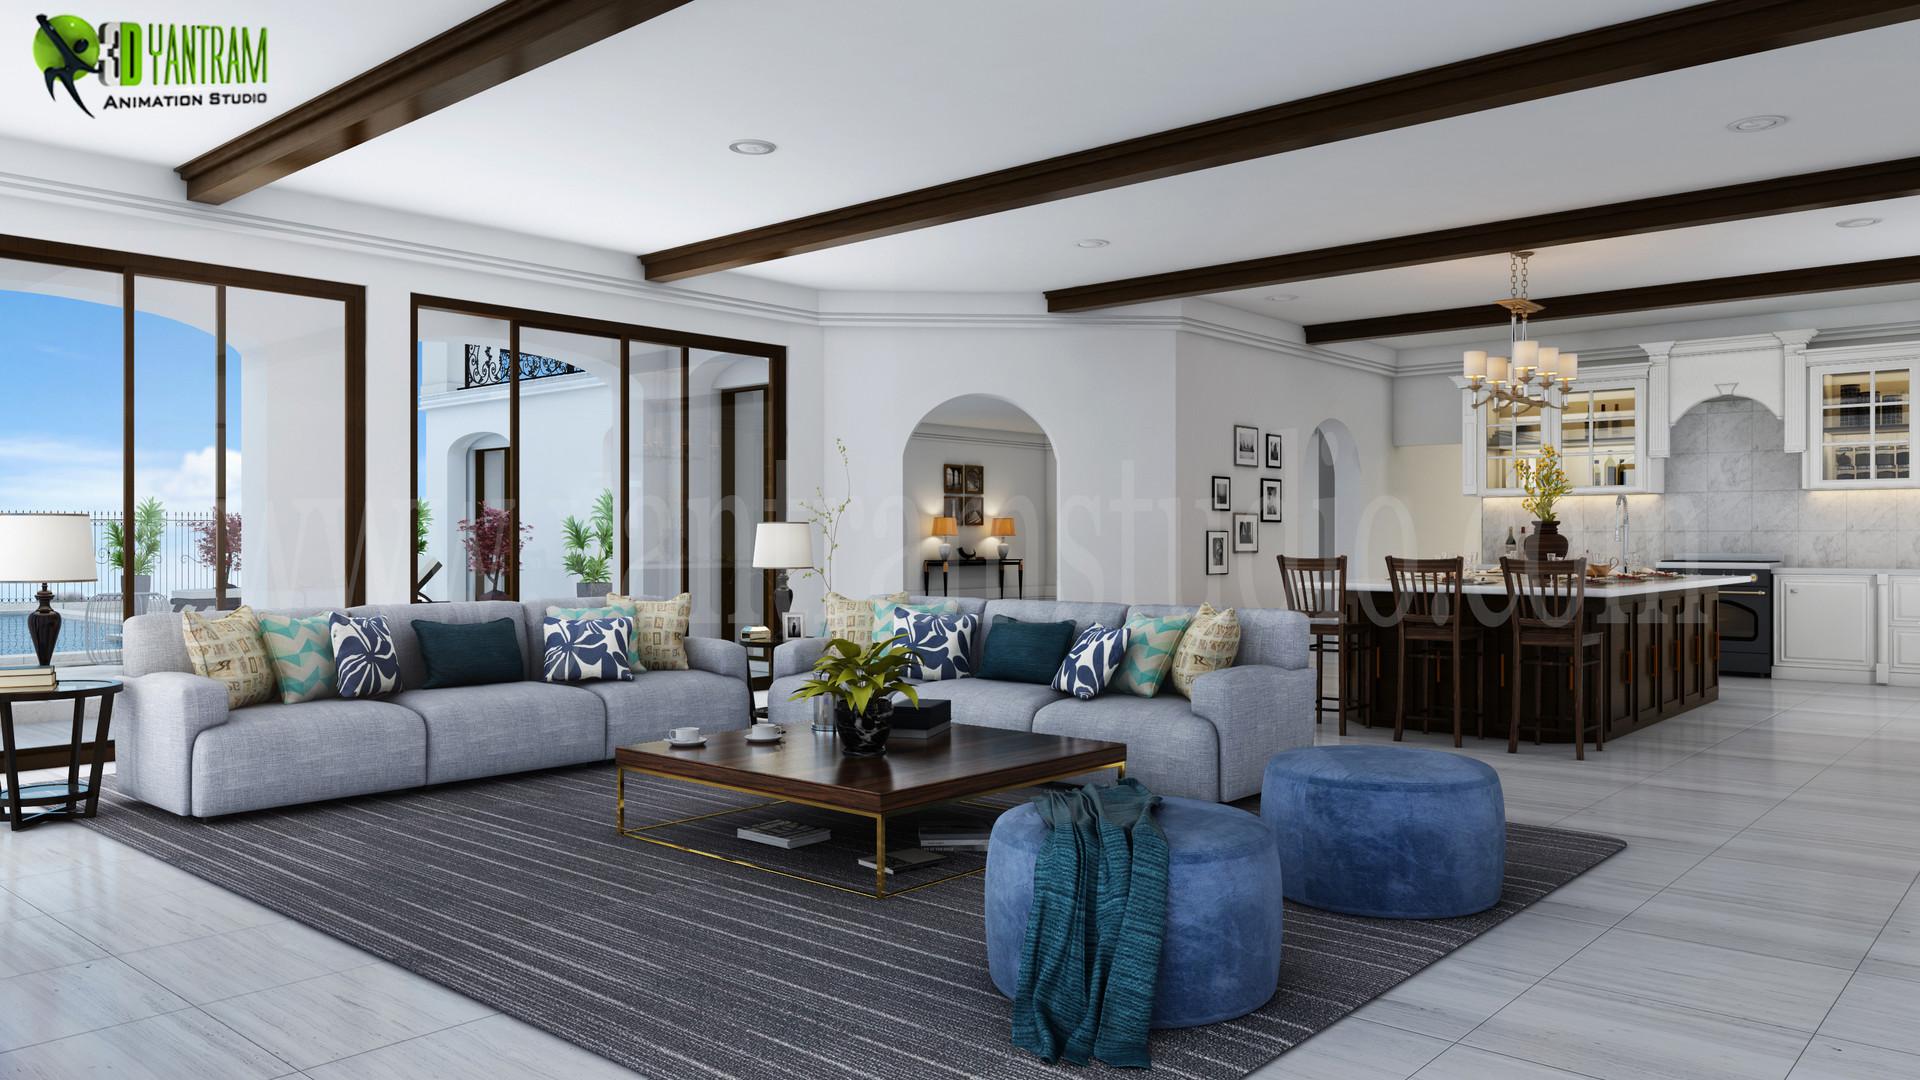 Artstation Modern 3d Living Room And Kitchen Design Chicago Yantram Architectural Design Studio